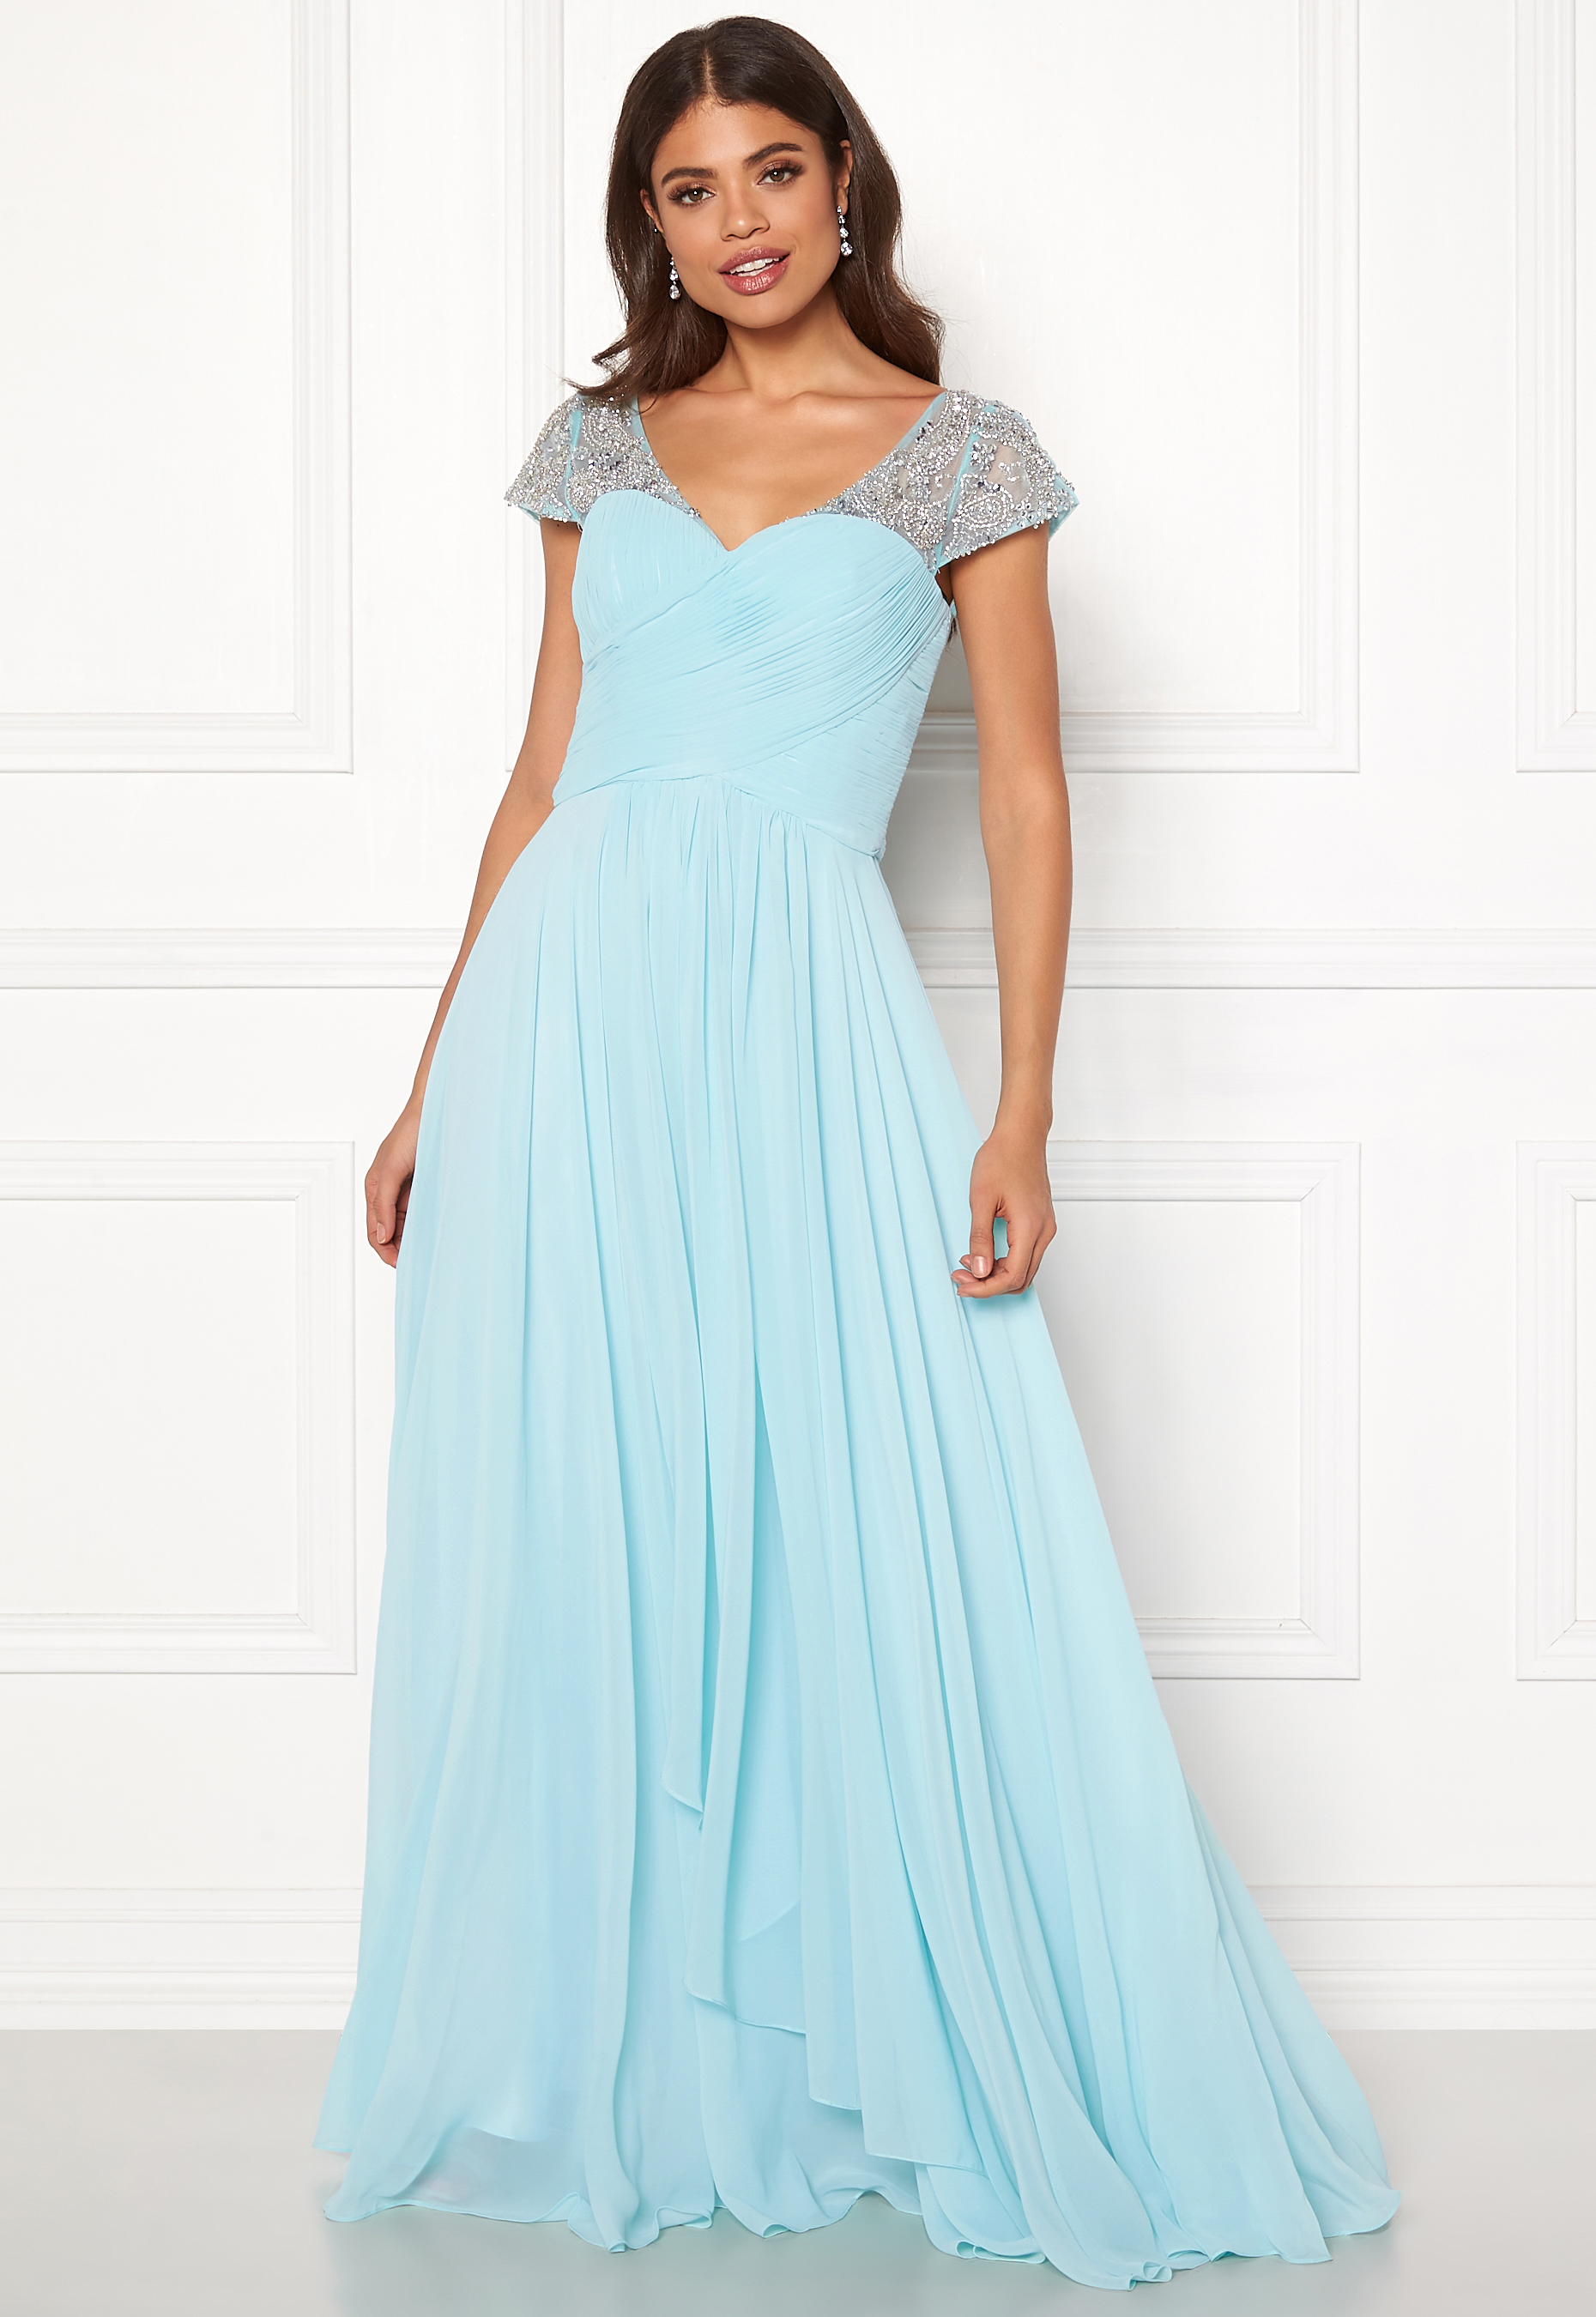 SUSANNA RIVIERI Sweetheart Chiffon Dress Navy Bubbleroom